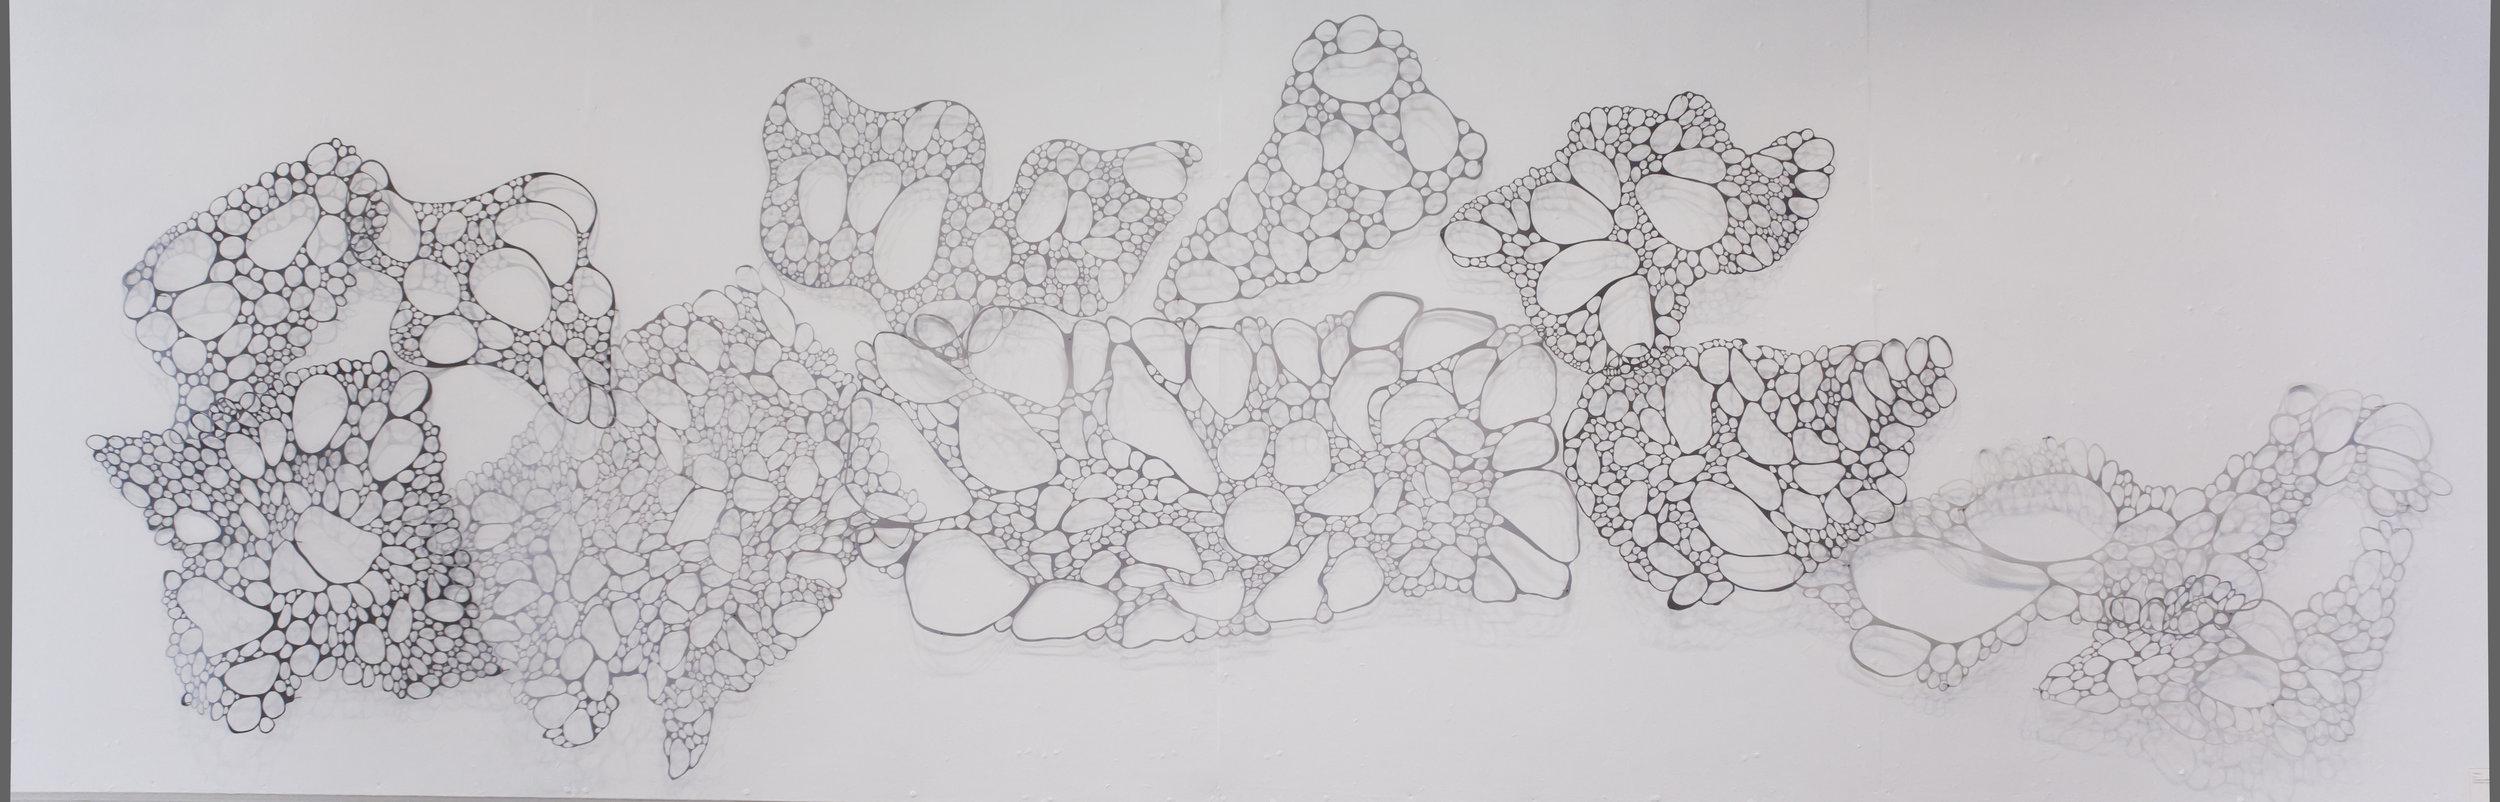 Porous  2015 Approx. 5' x 15'